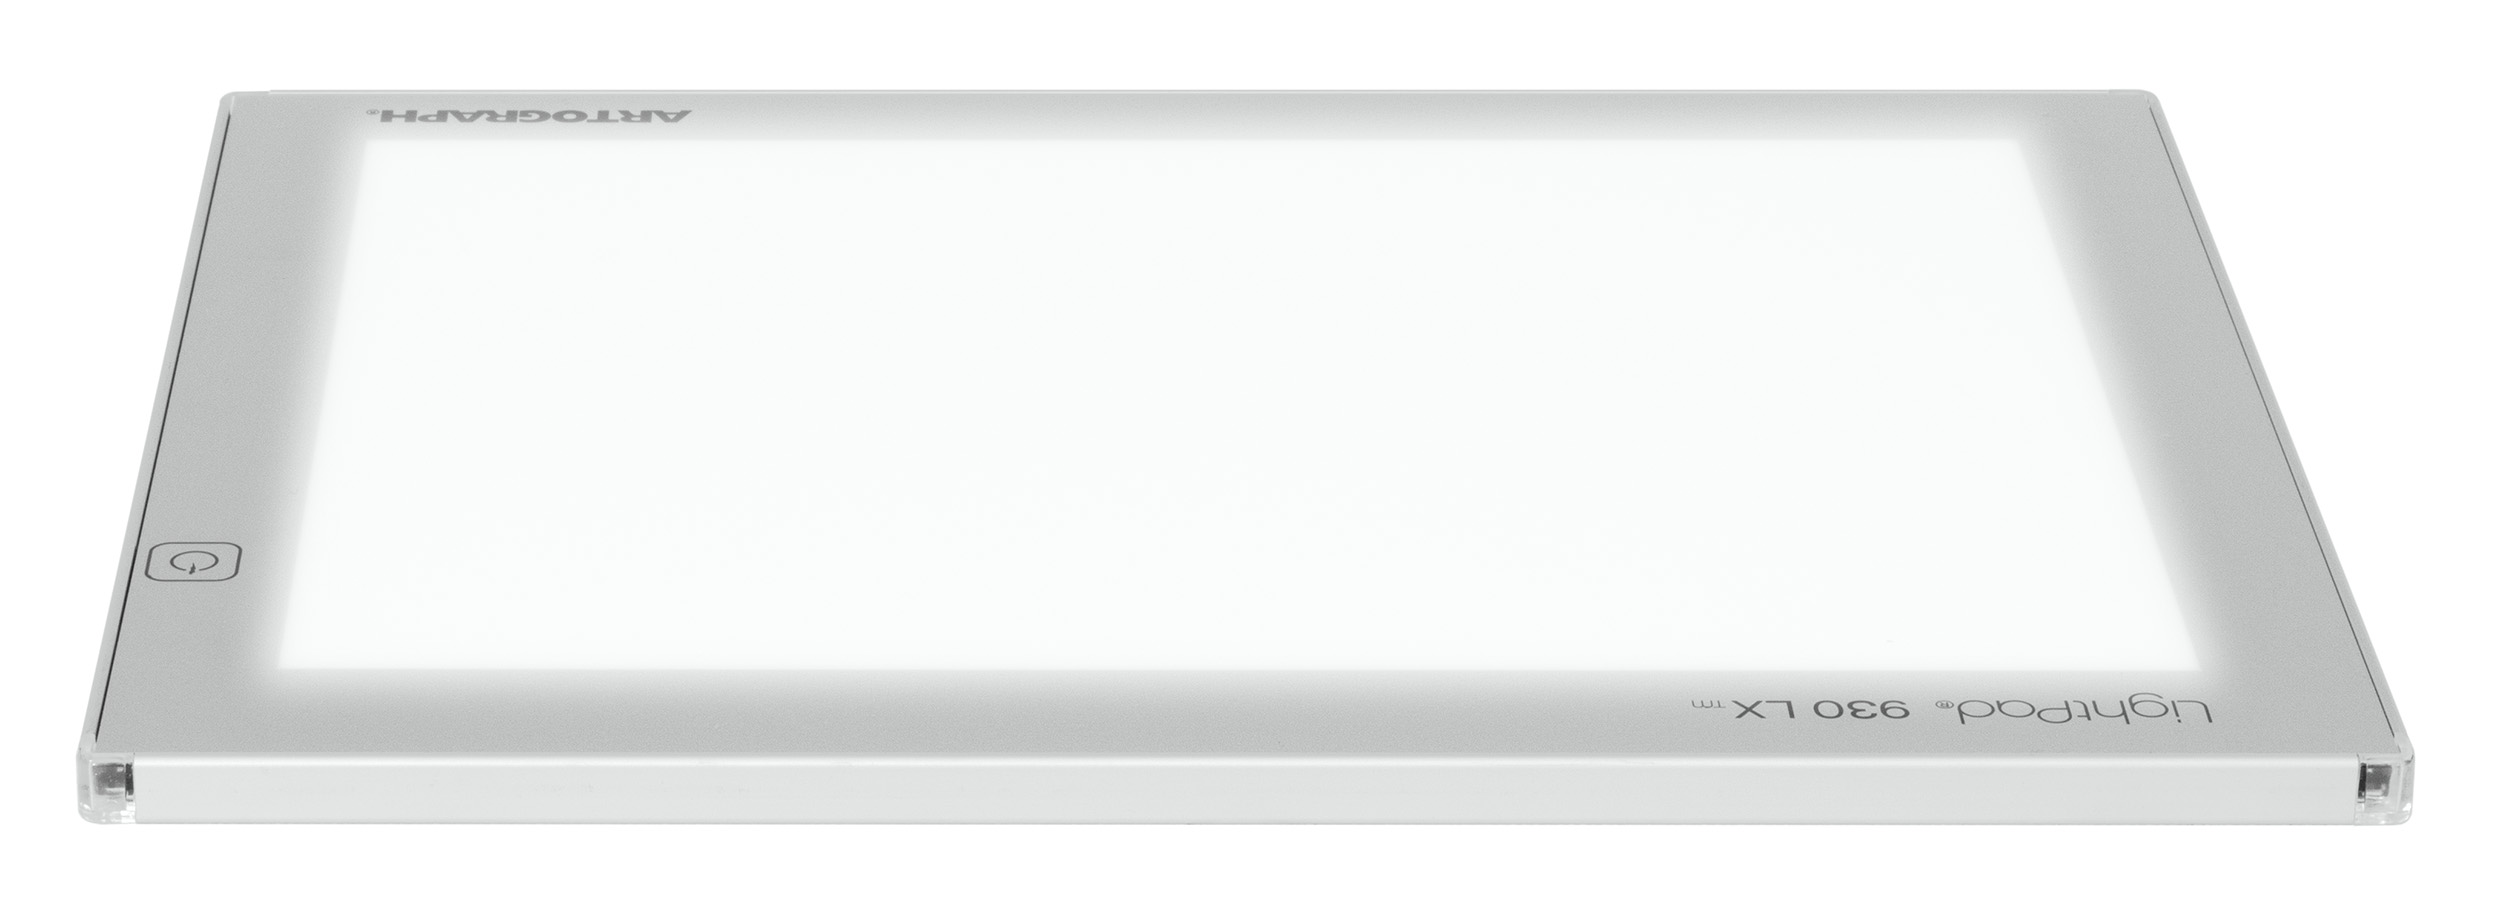 25930-LightPad-930-LX-rear